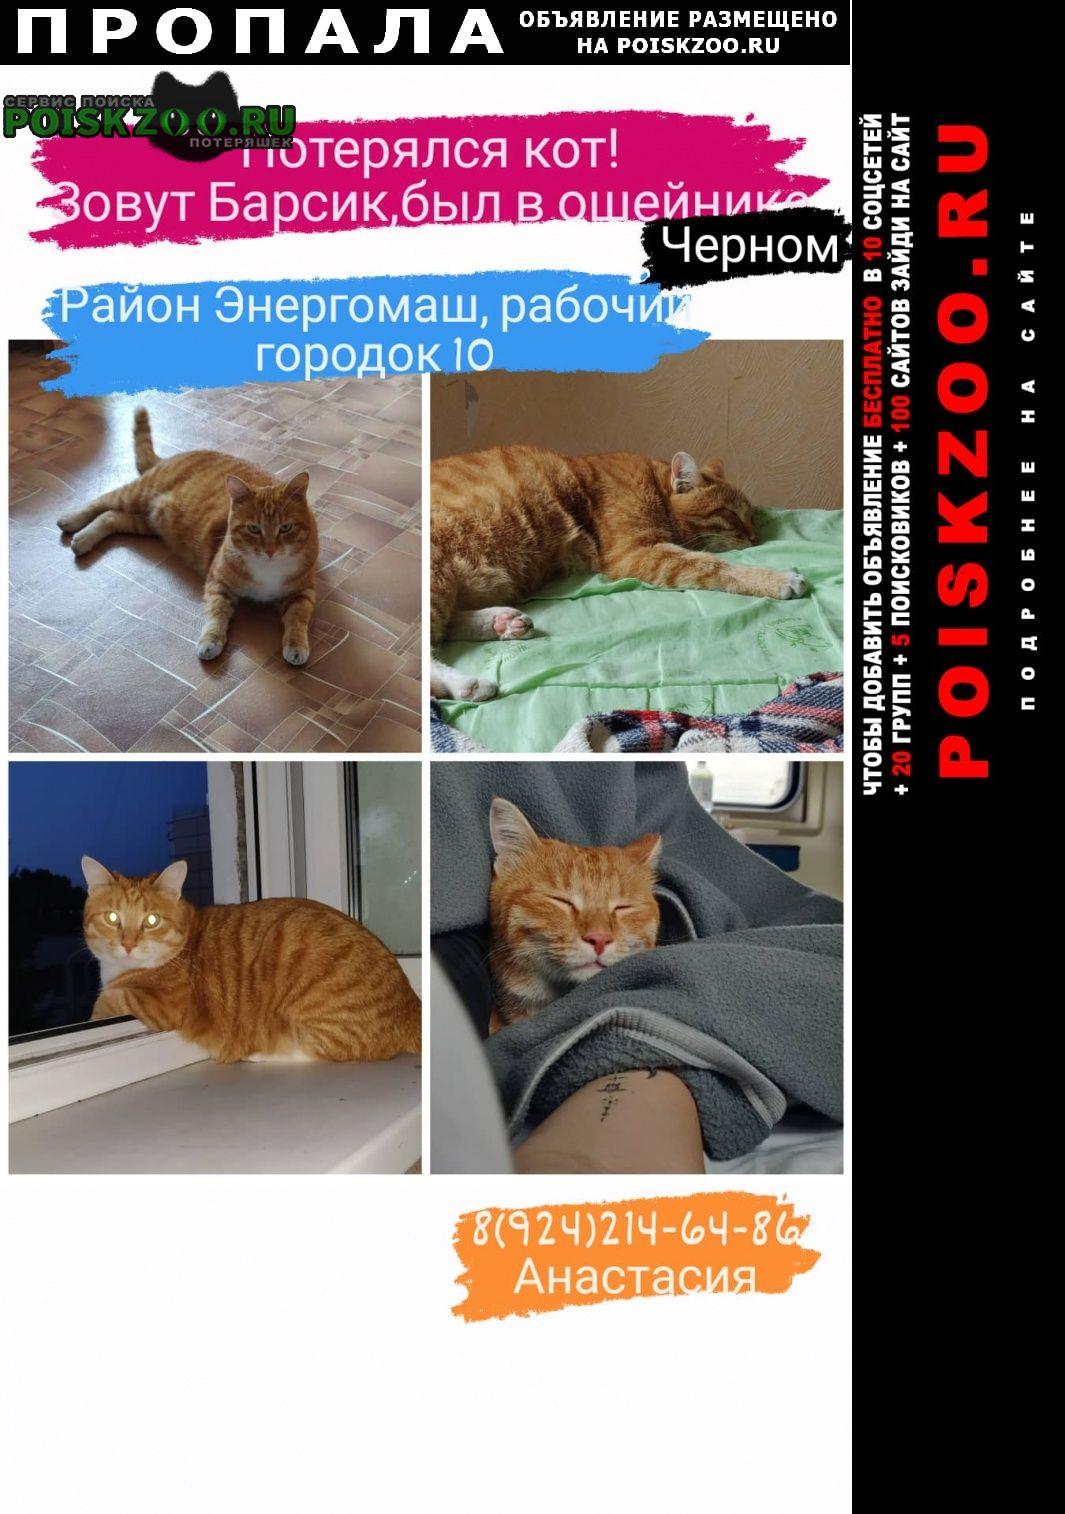 Хабаровск Пропал кот барсик